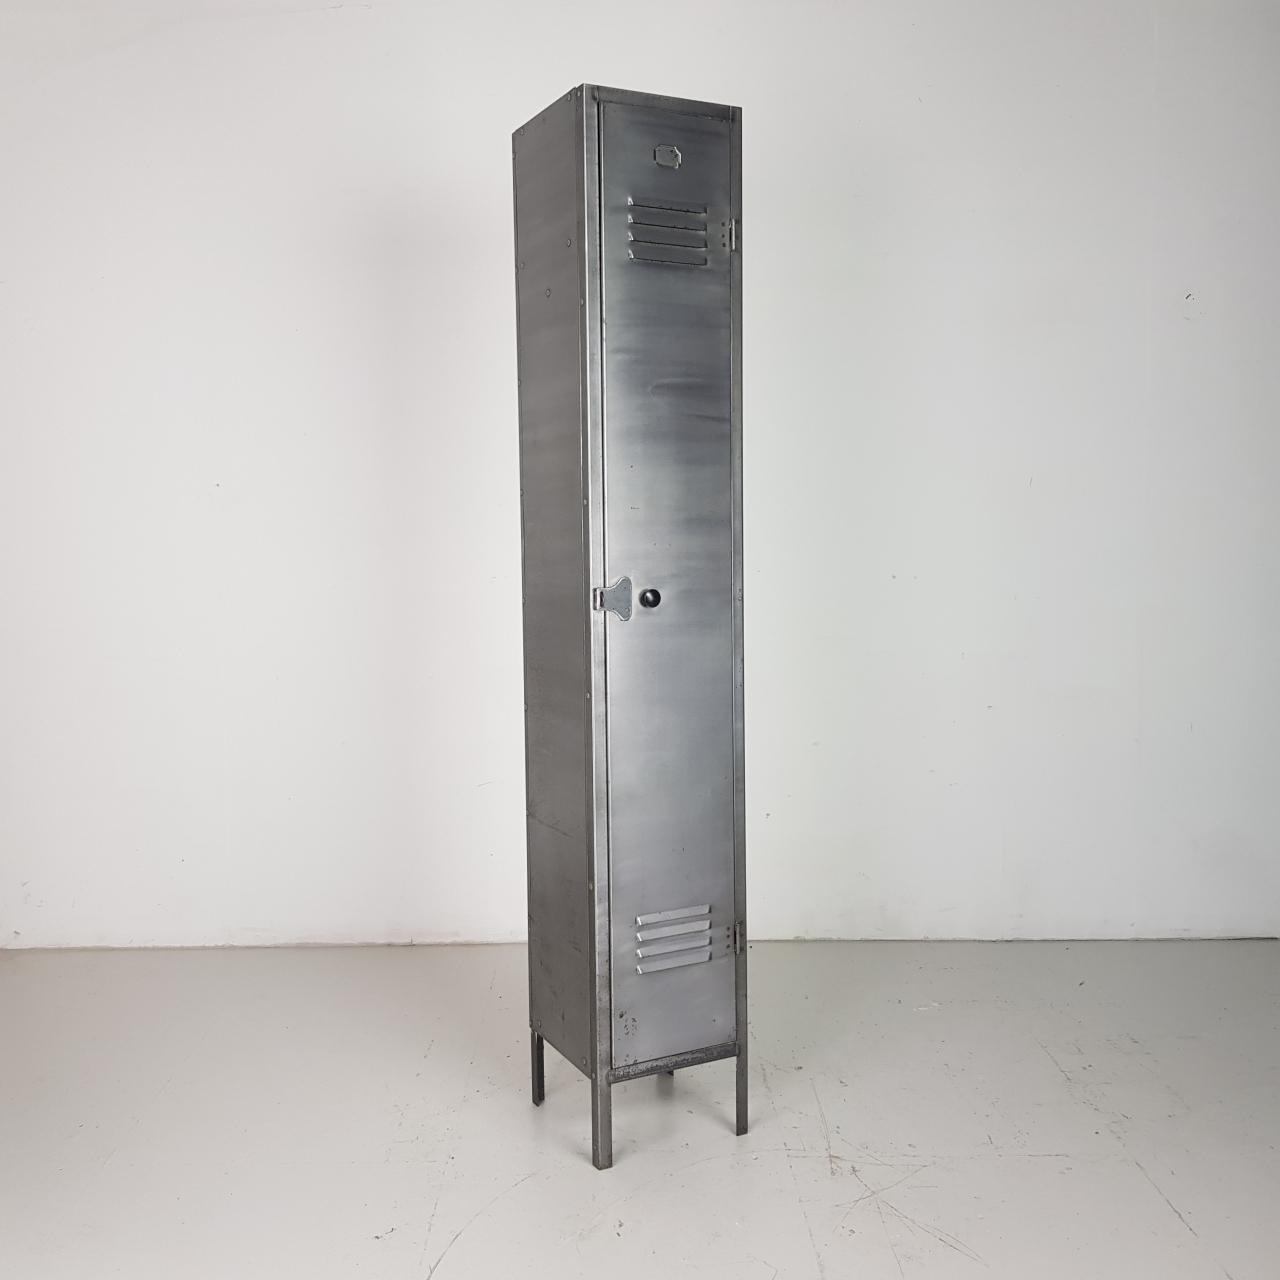 20200120 151630